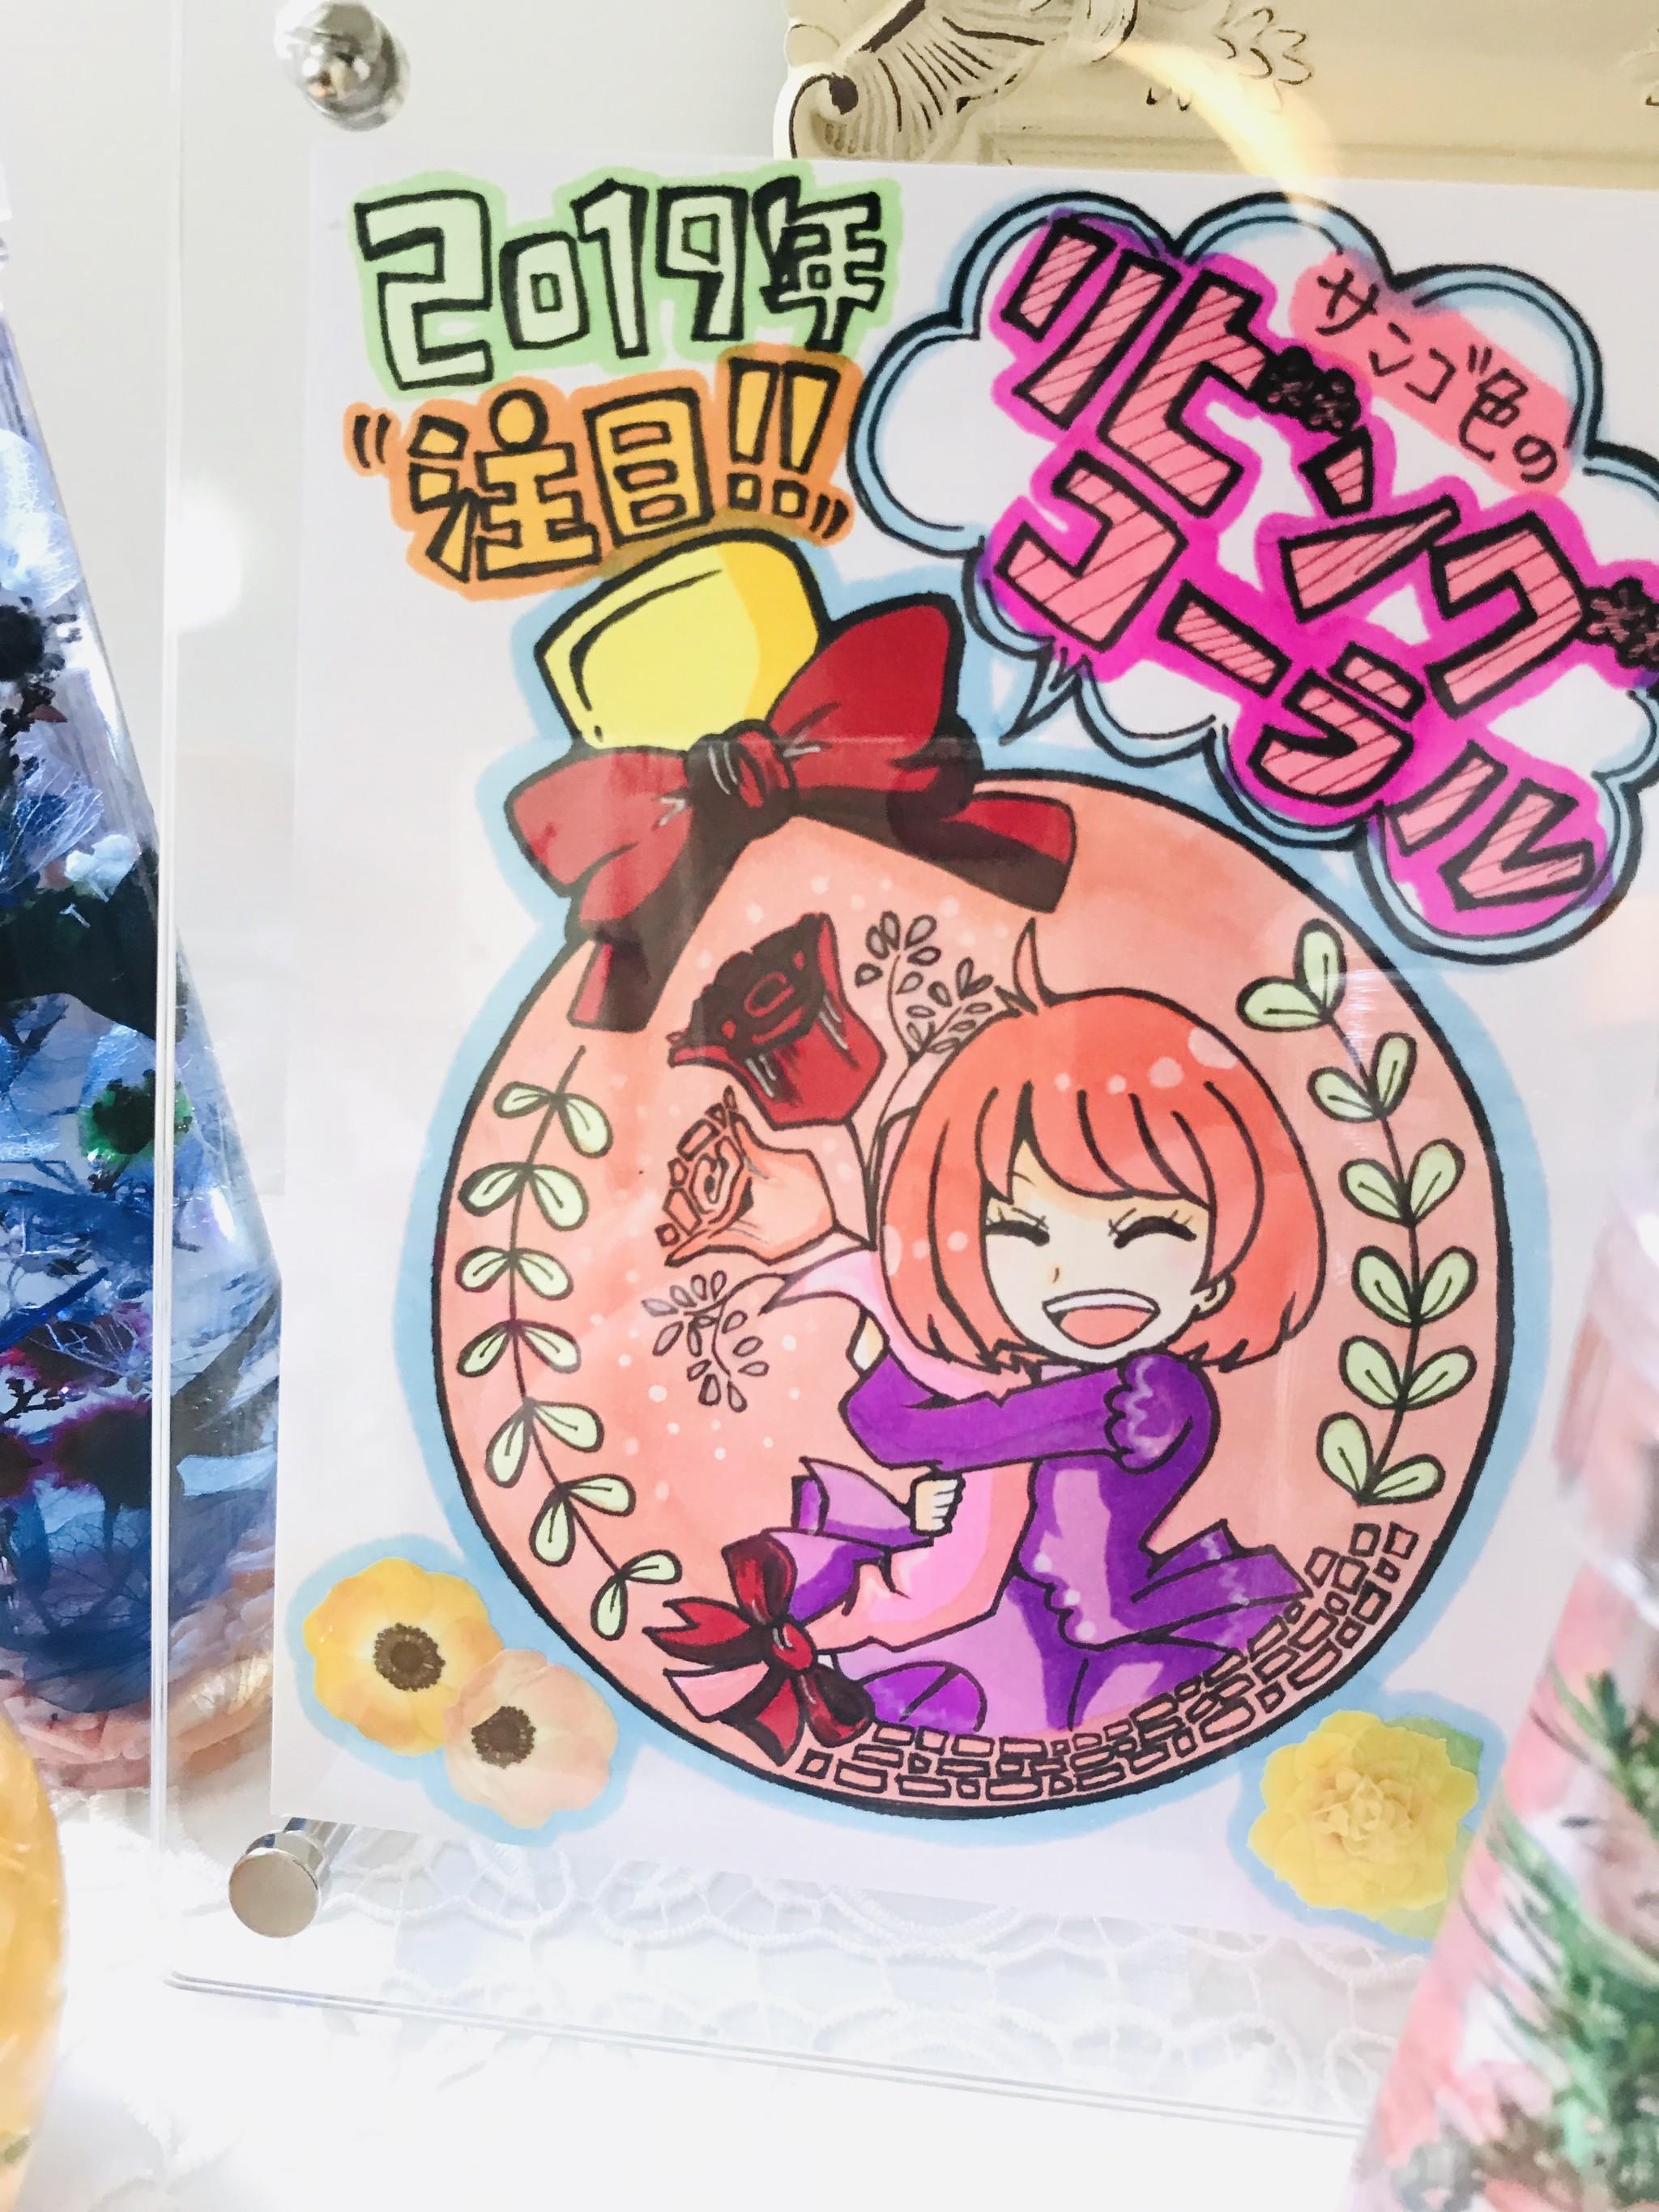 CielPlage篠﨑純子の似顔絵書いてくれました